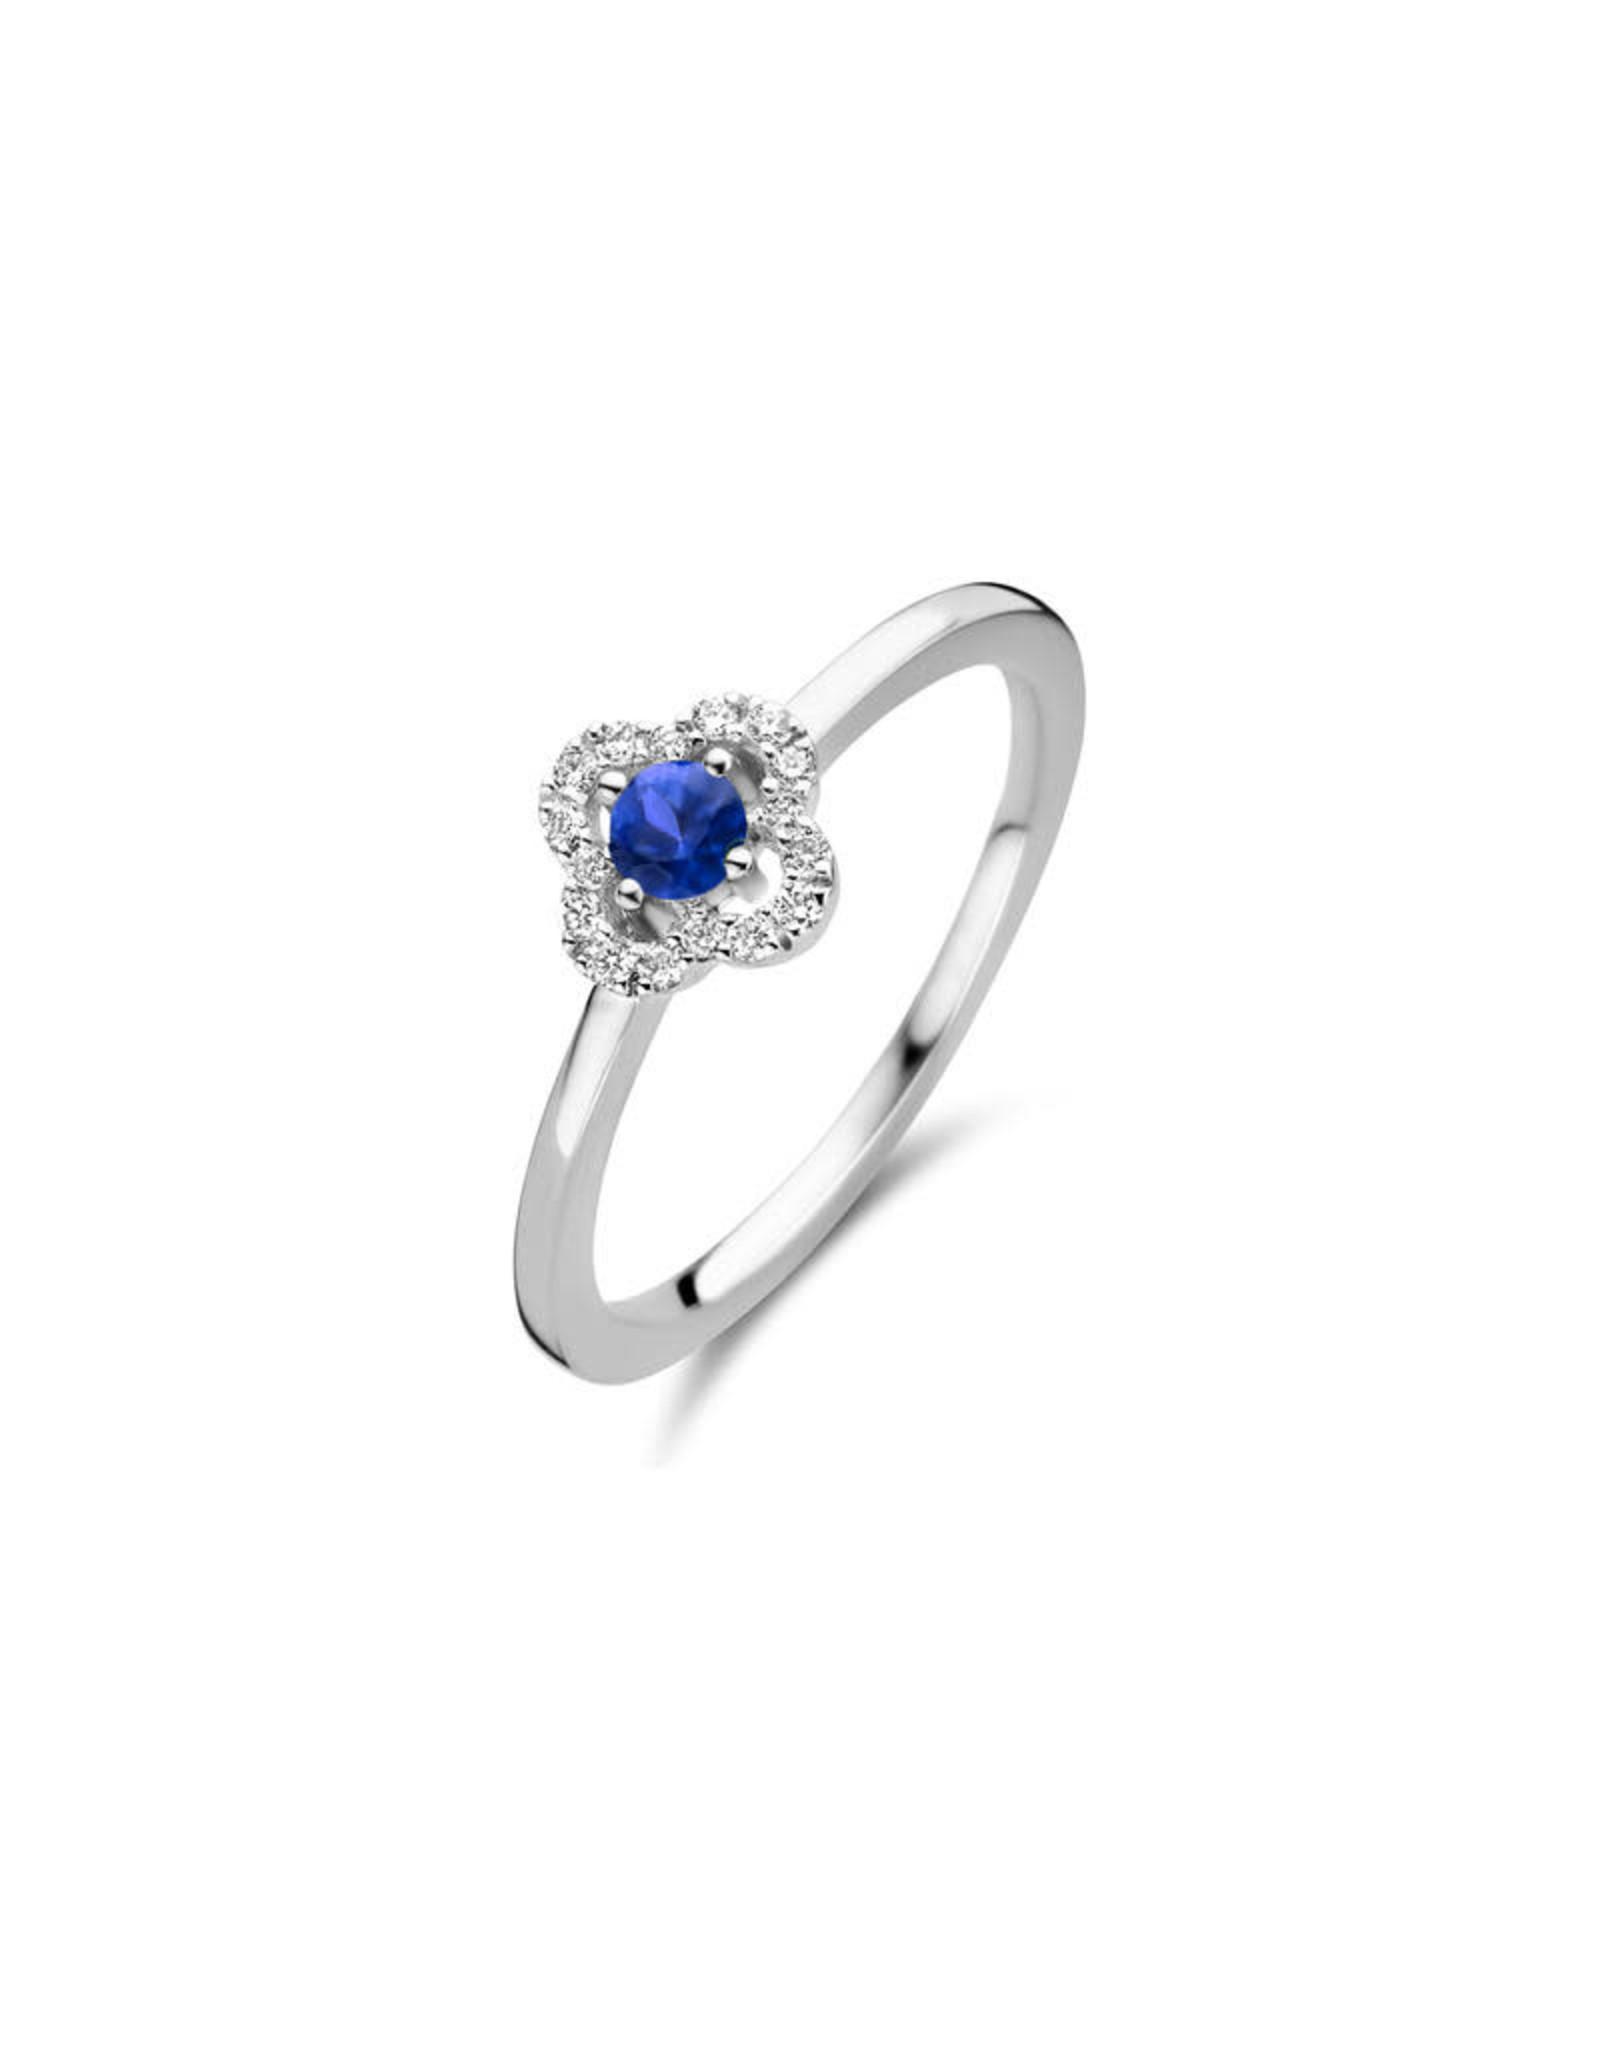 One More Ring One More Wit Goud 18kt 062249/SA-54 Blauwe Saffier Briljant